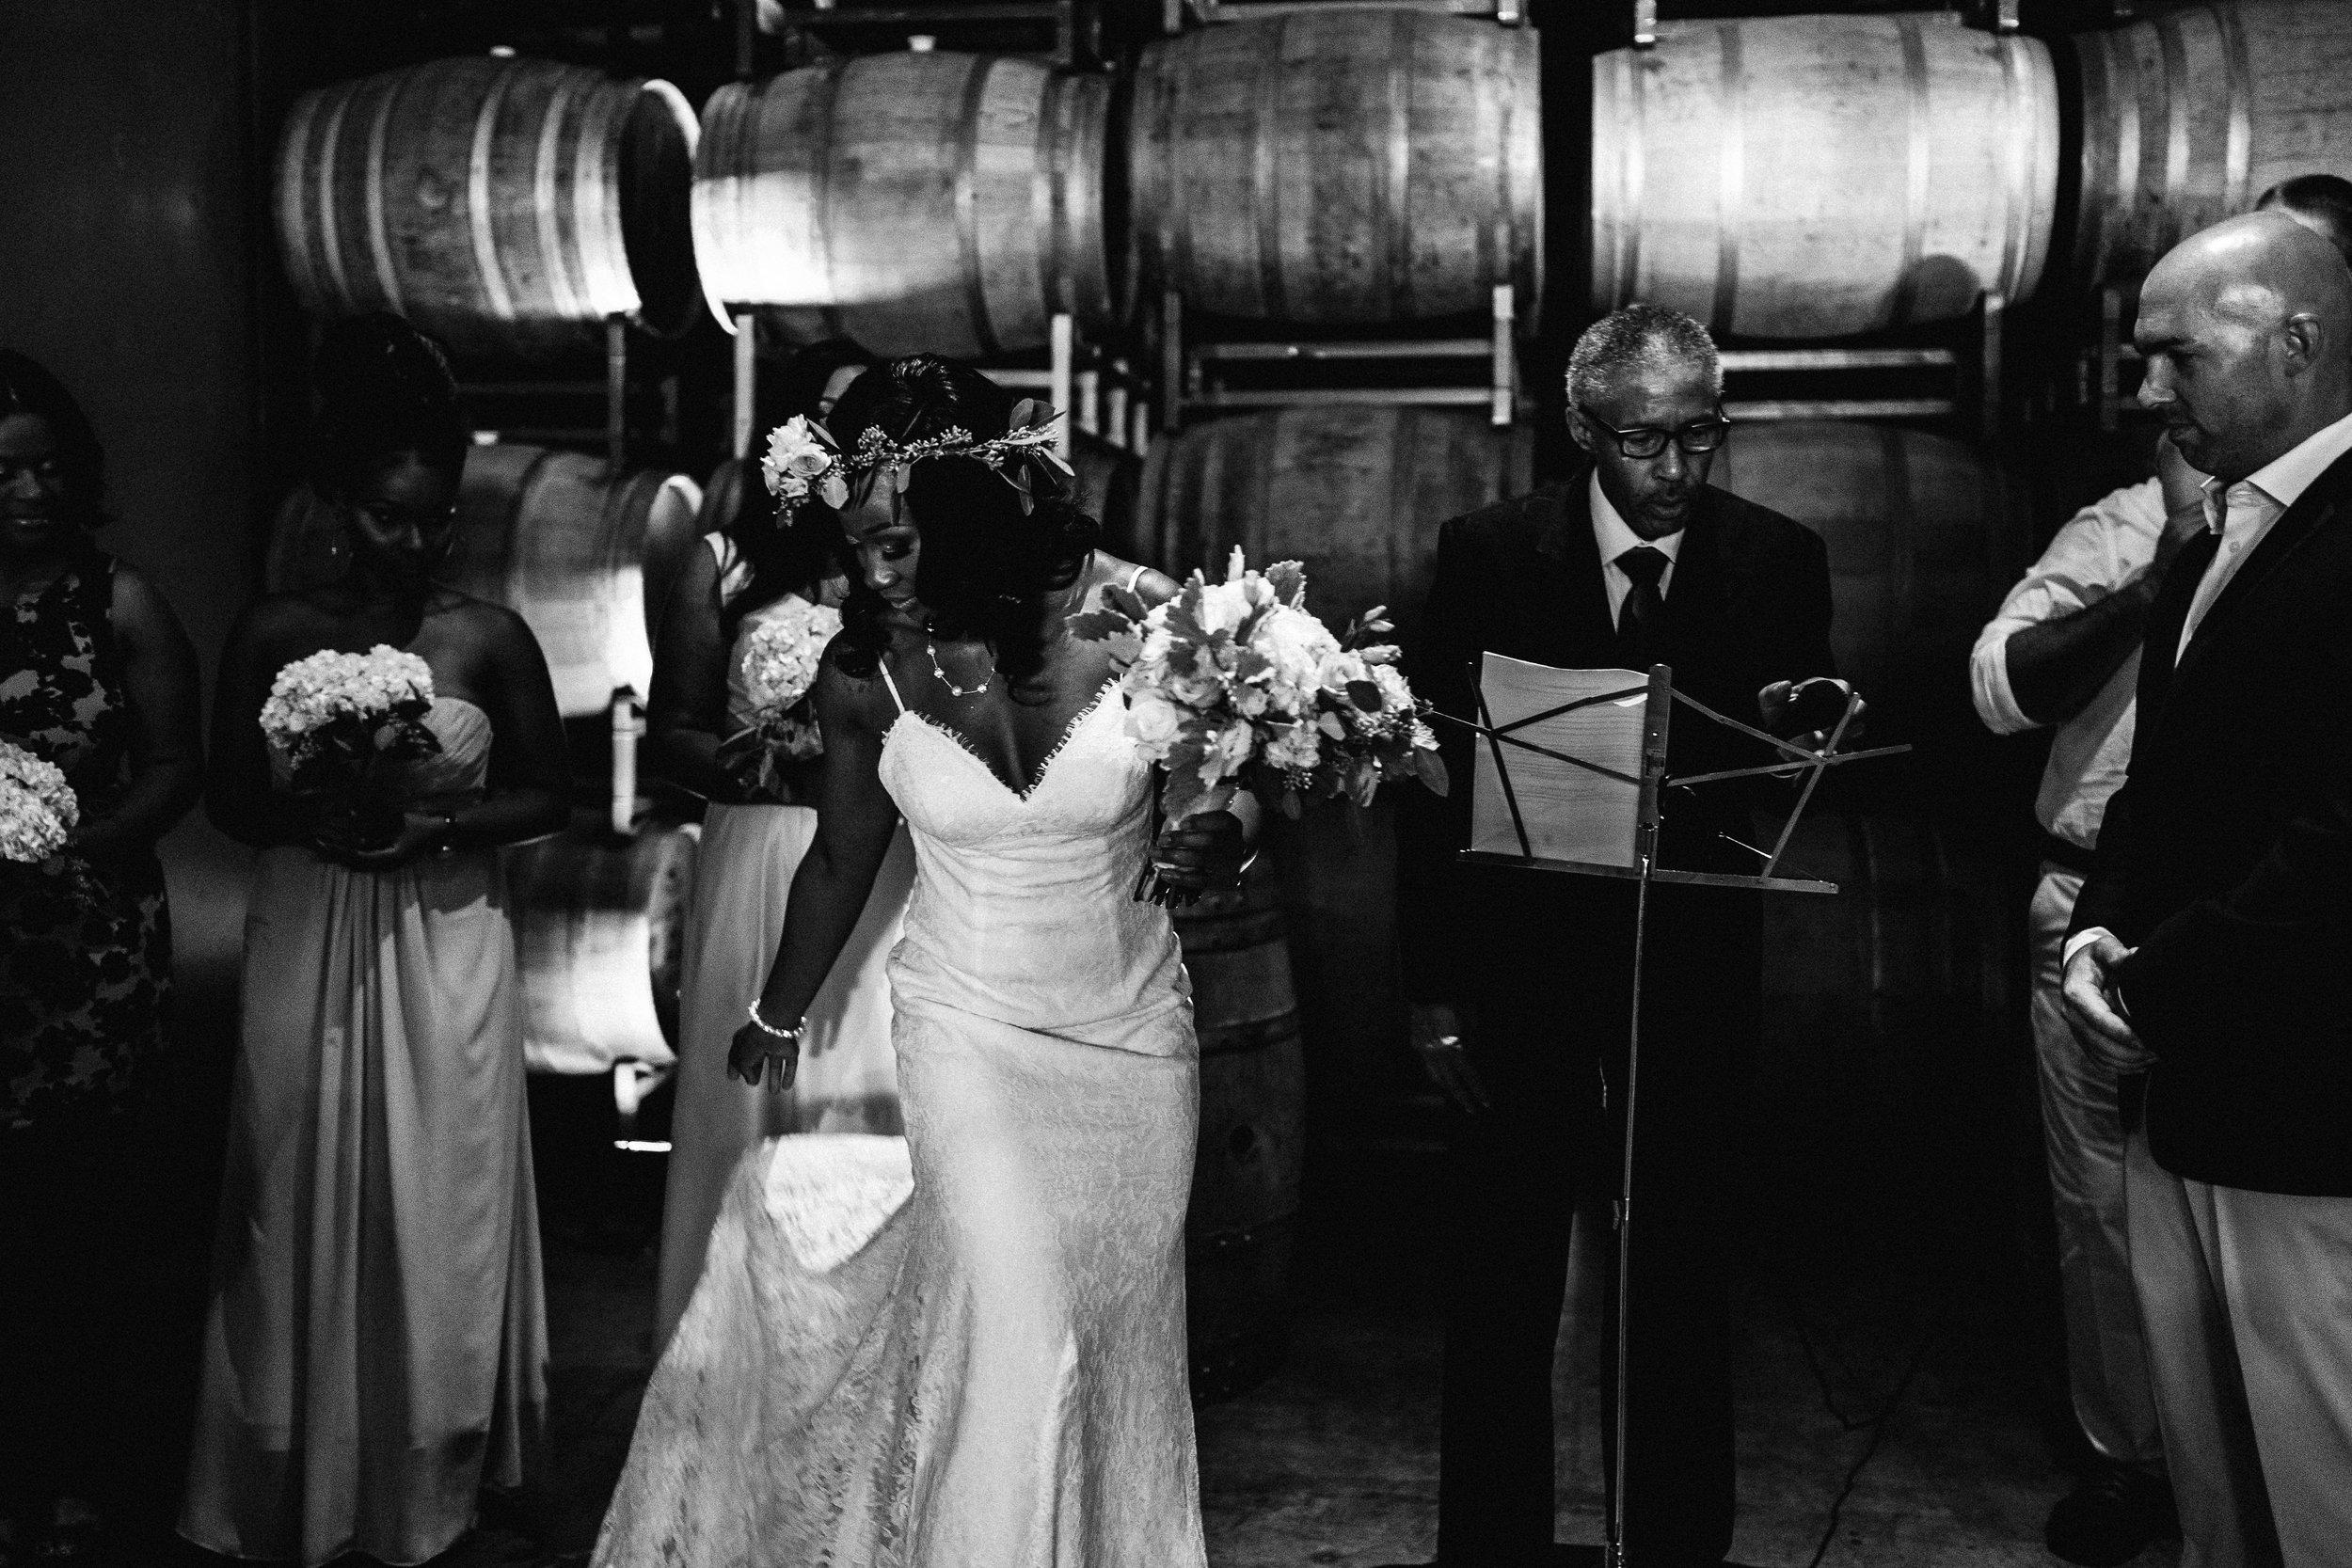 2017.09.16 Ashley and Chuck O'Day Quantam Leap Winery Wedding (142 of 462).jpg